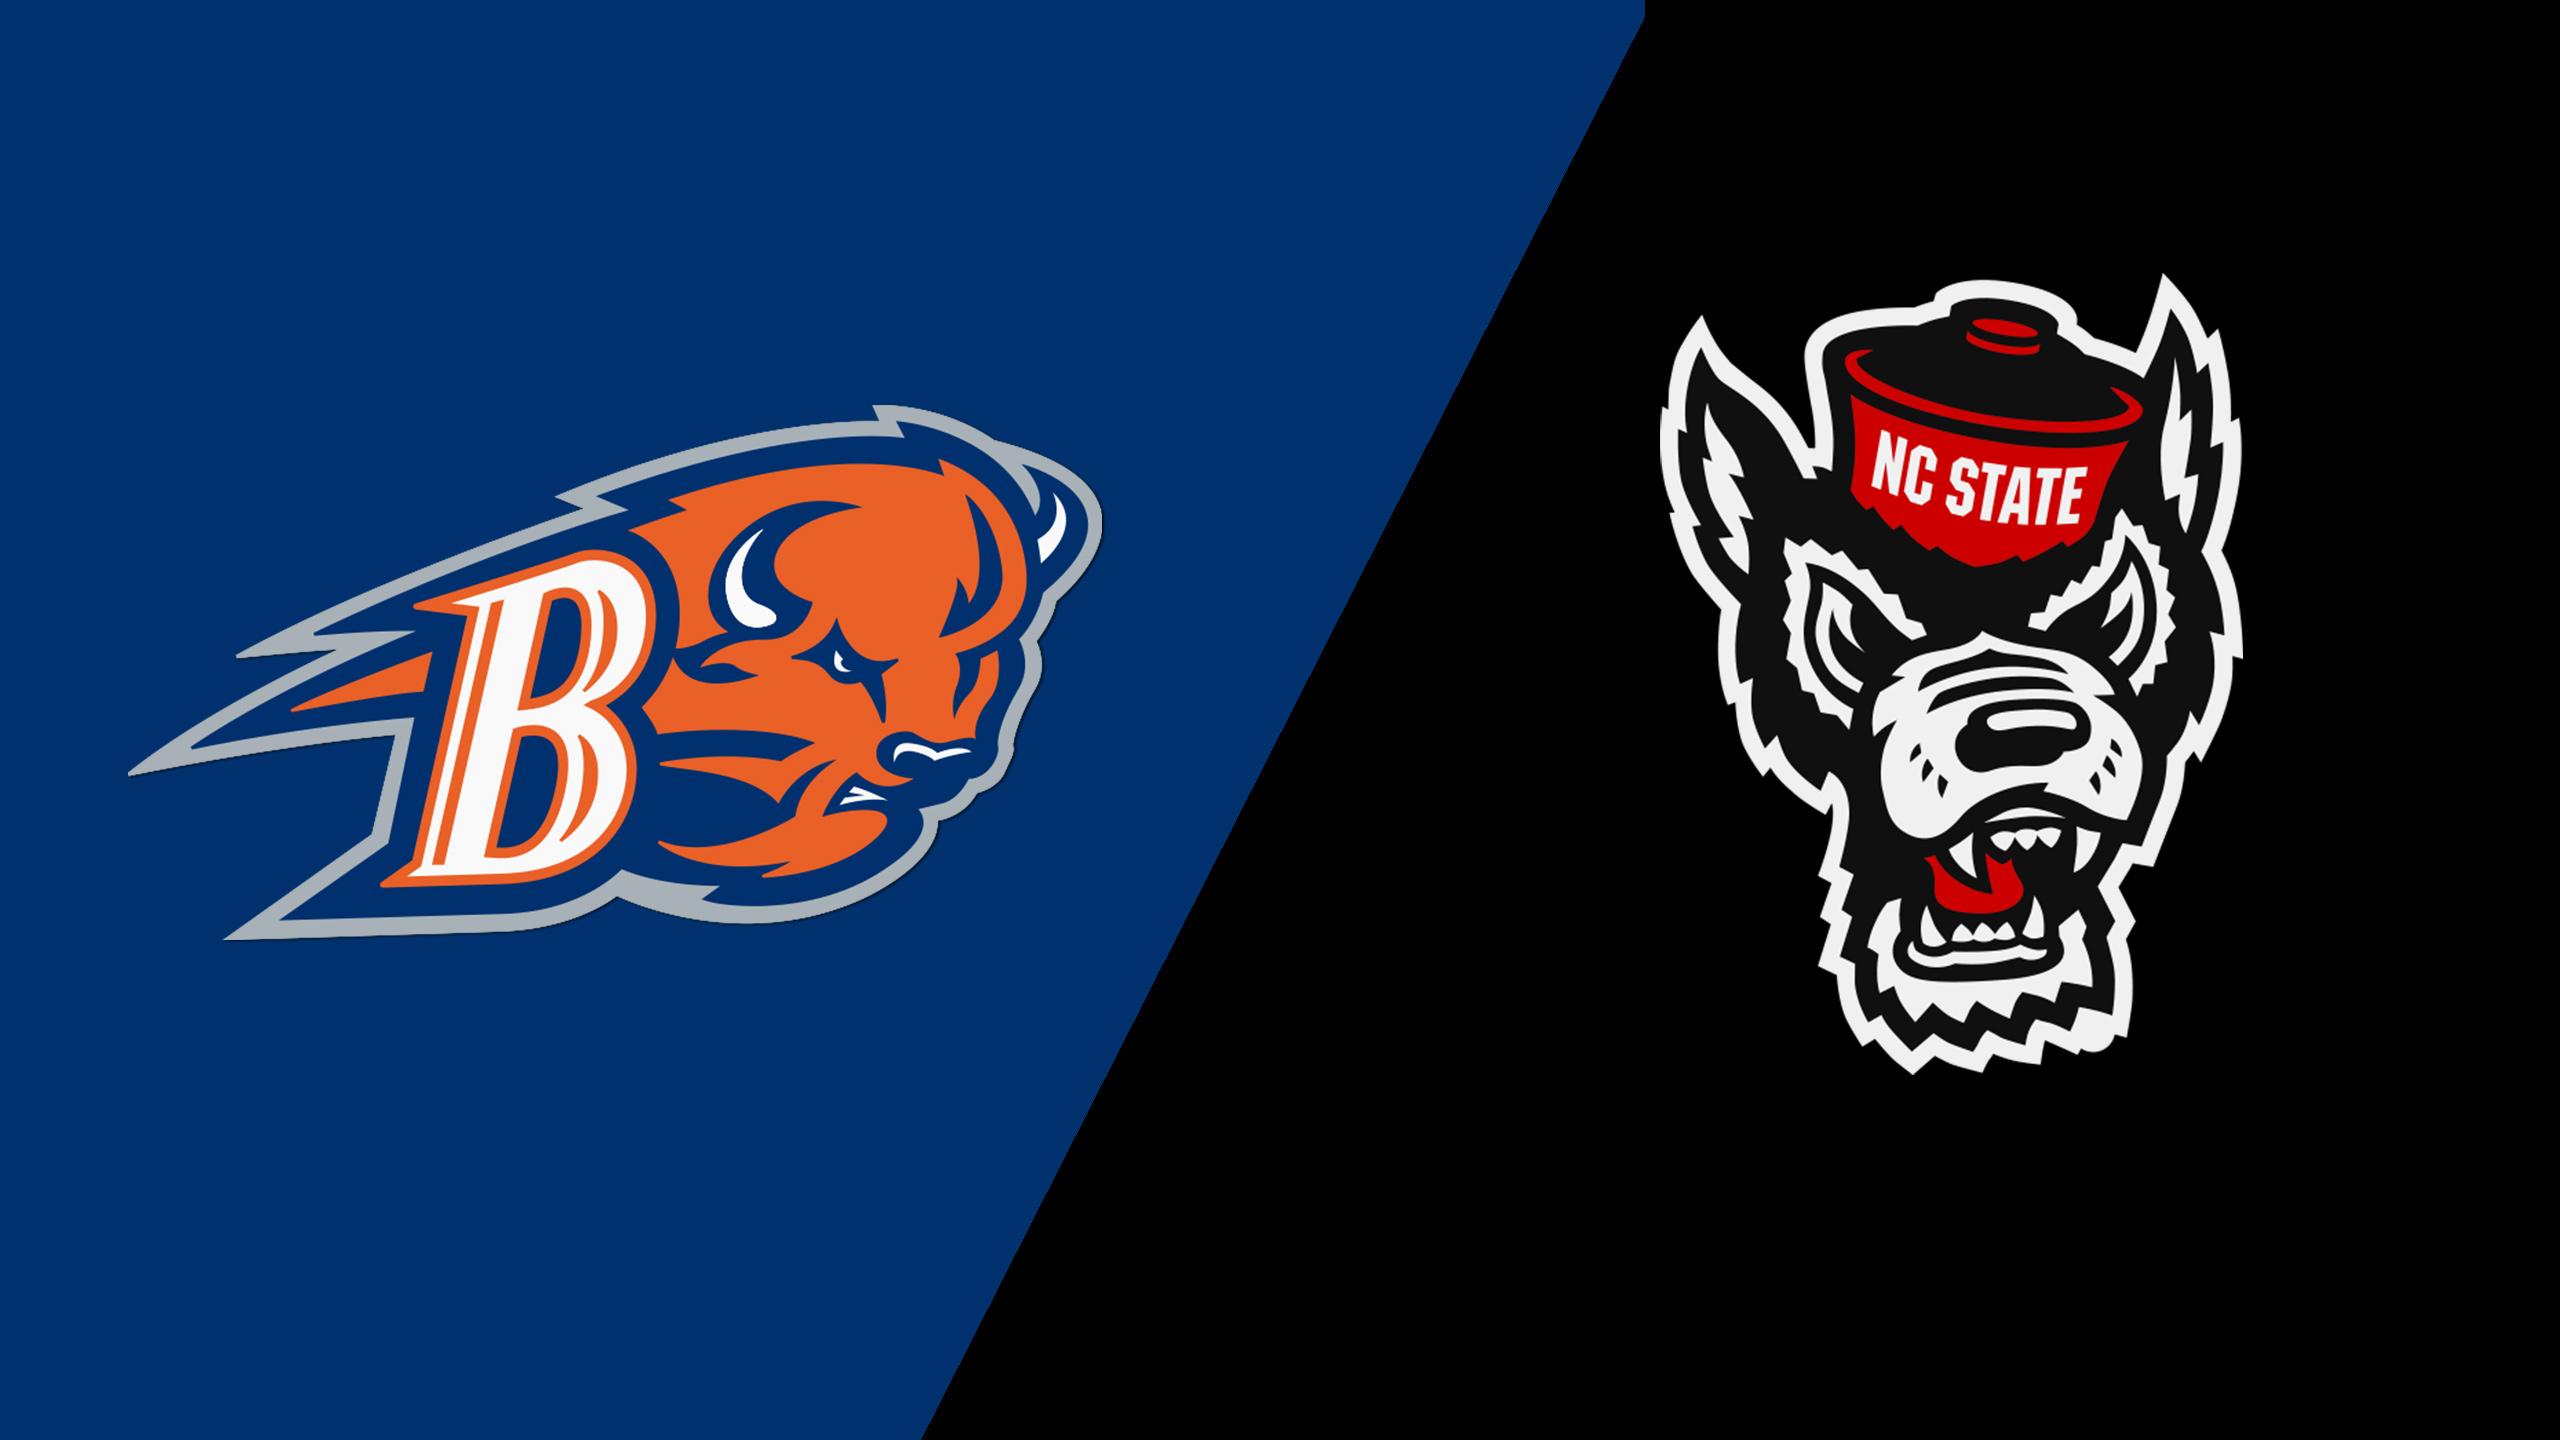 Bucknell vs. NC State (Baseball)